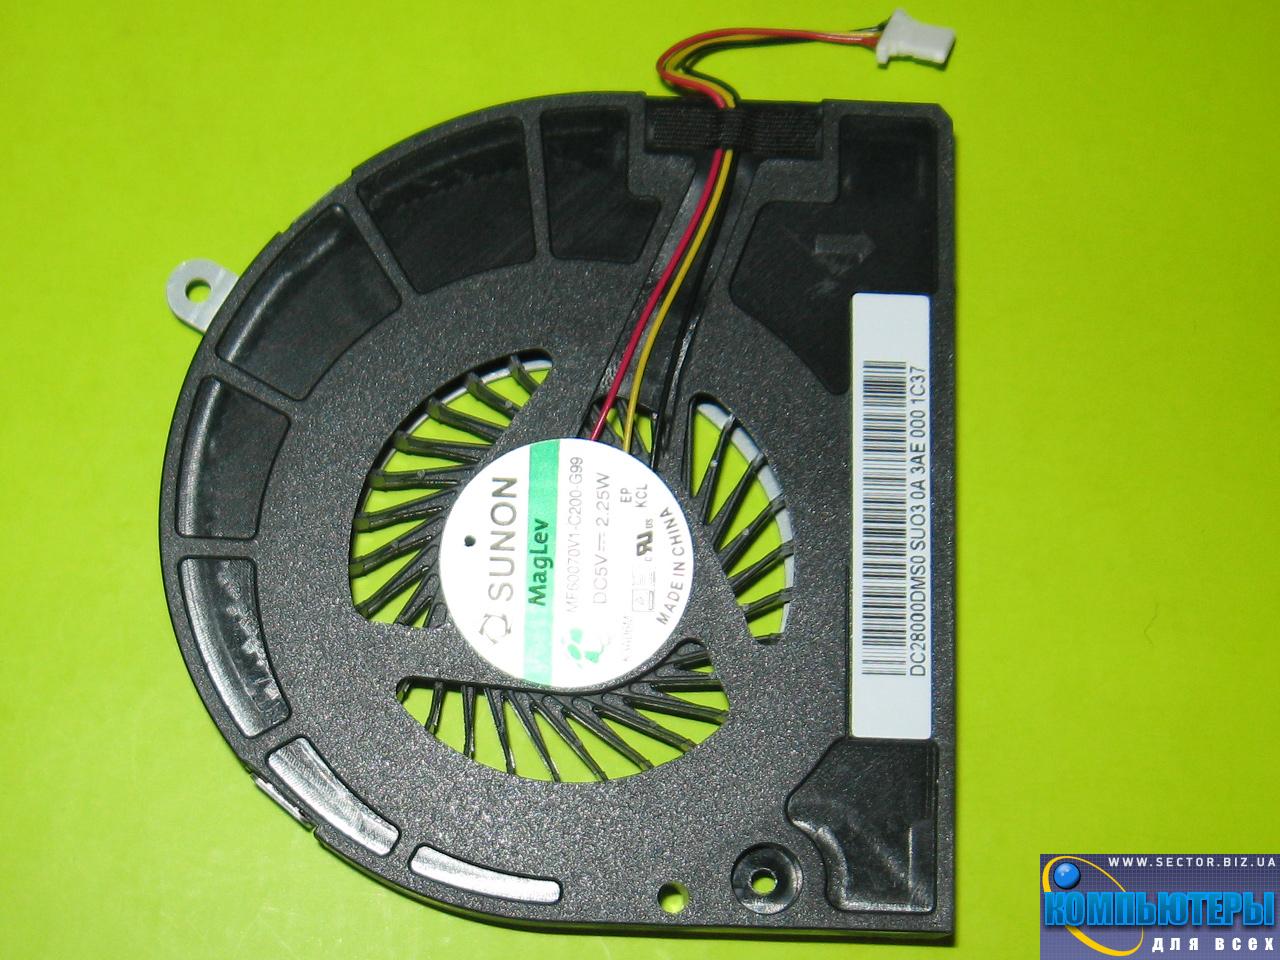 Кулер к ноутбуку Acer Aspire E1-530 E1-530G E1-570 E1-570G p/n: MF60070V1-C200-G99. Фото № 3.